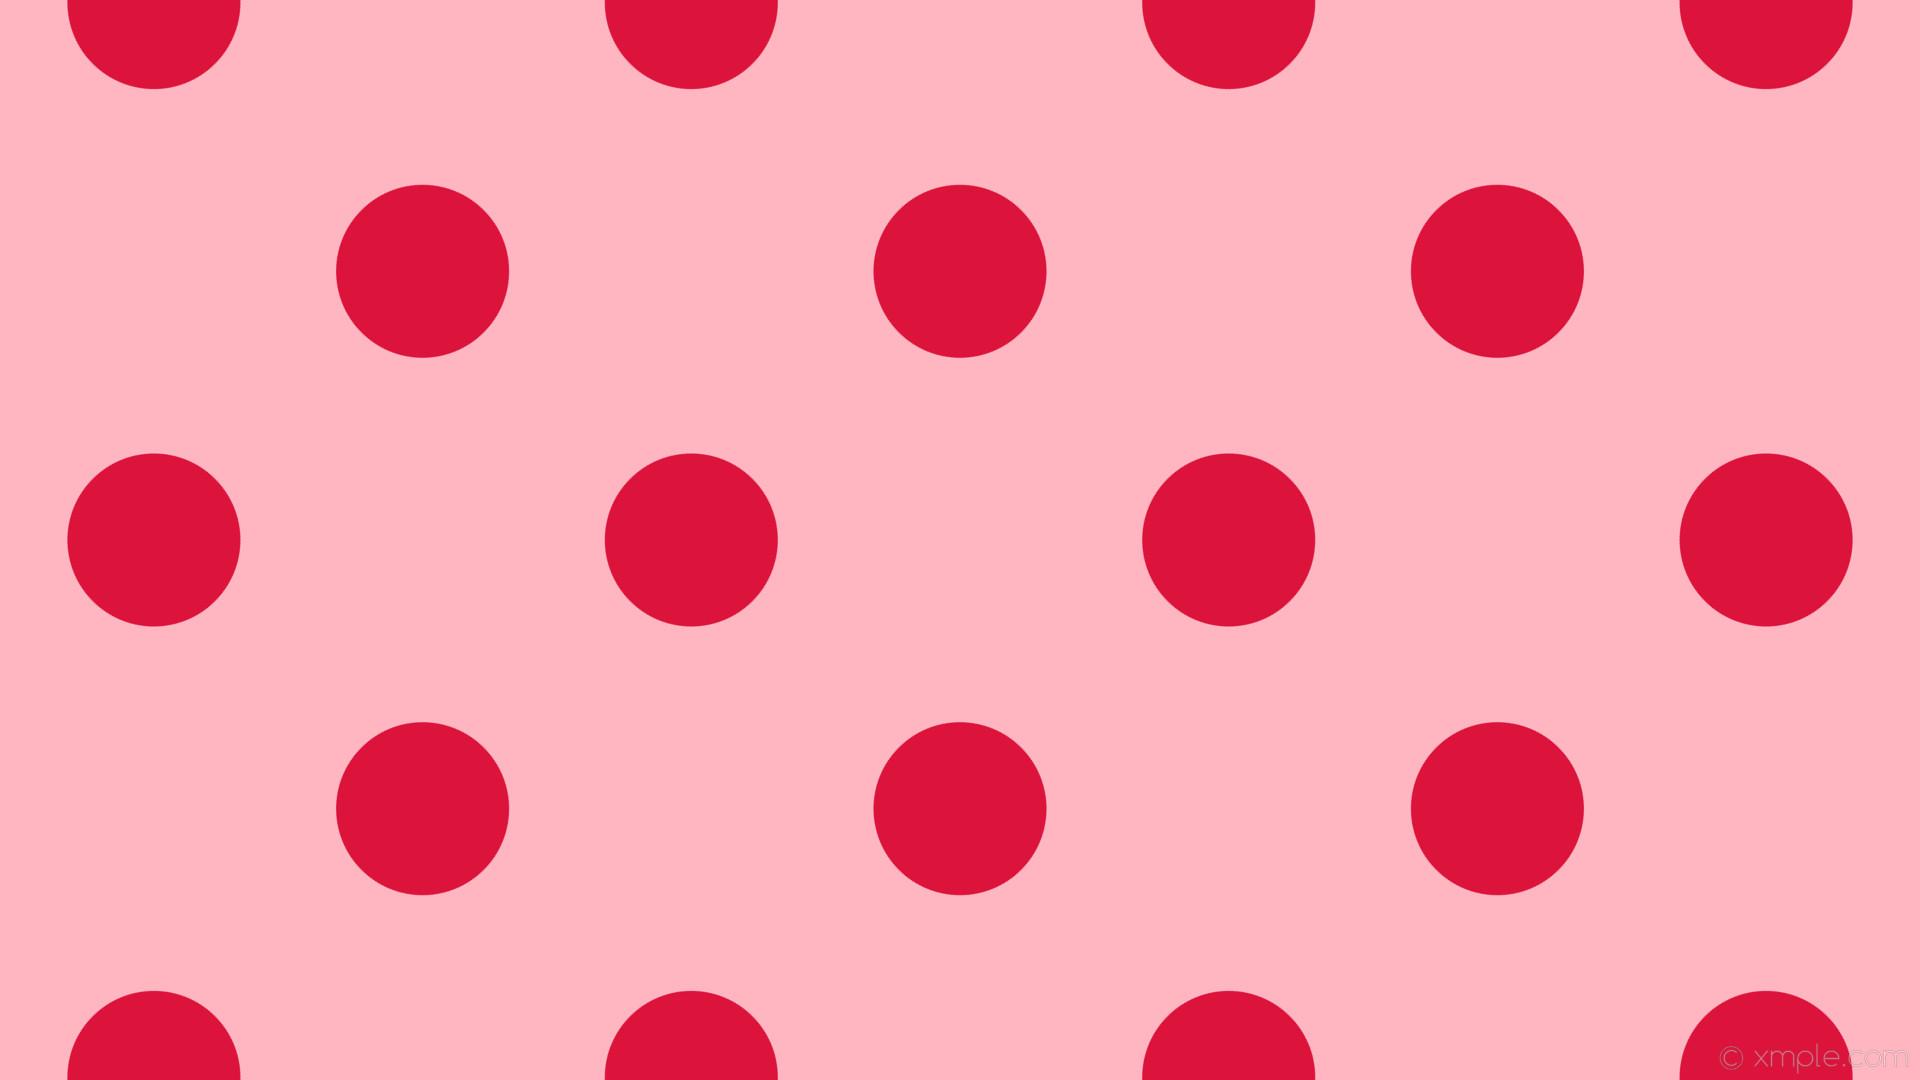 wallpaper pink polka dots spots red light pink crimson #ffb6c1 #dc143c 315°  173px